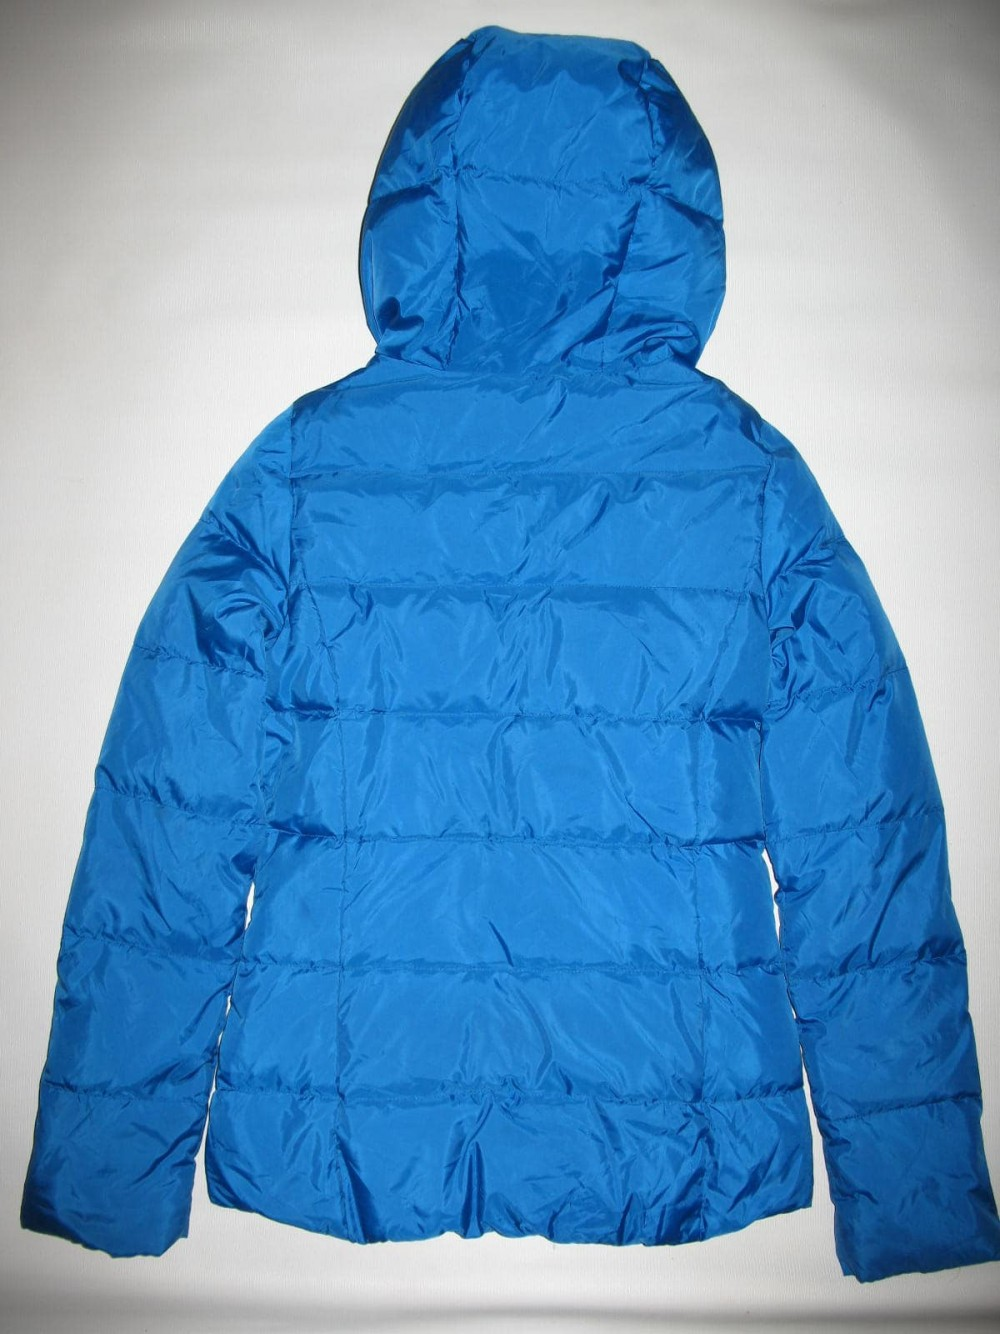 Куртка LOGG outdoor down jacket lady (размер S/XS) - 1